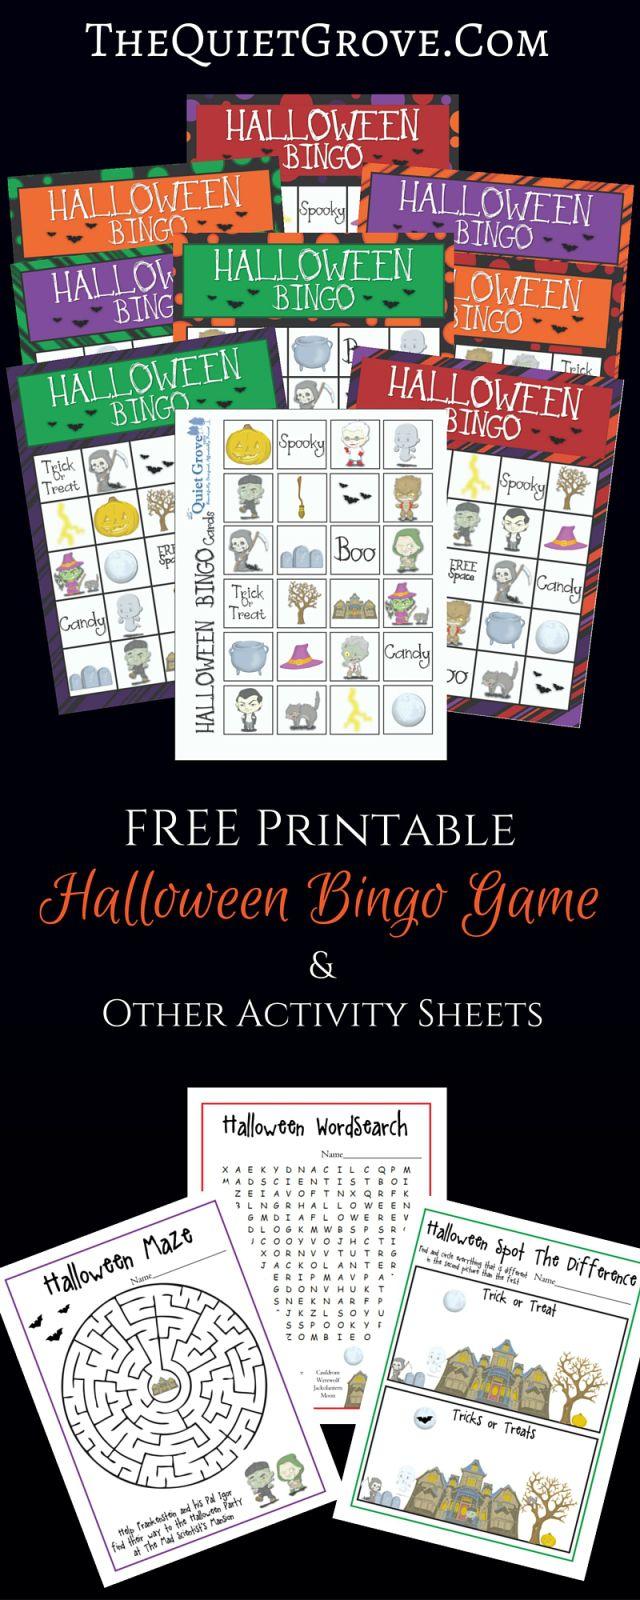 free printable halloween bingo game other activity sheets - Preschool Halloween Bingo